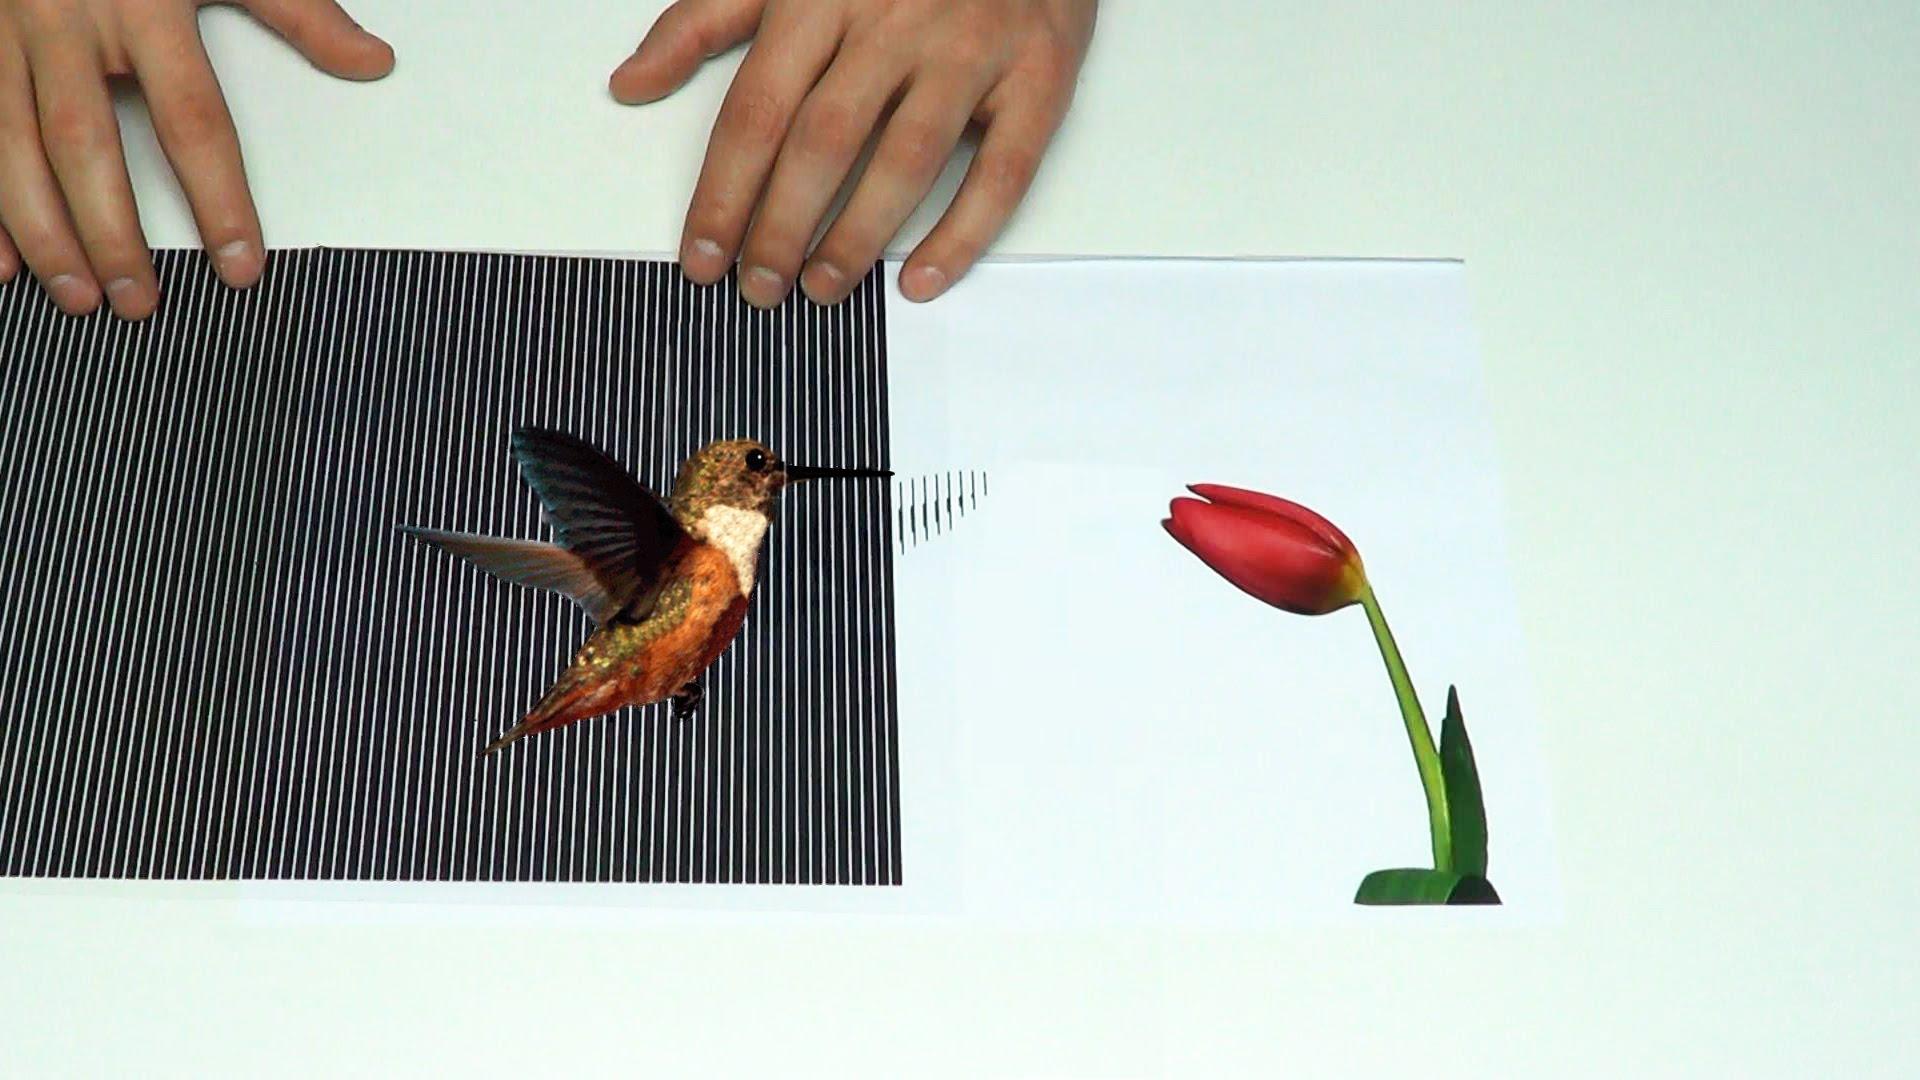 3d Optical Illusion Hd Wallpaper Amazing Animated Optical Illusions